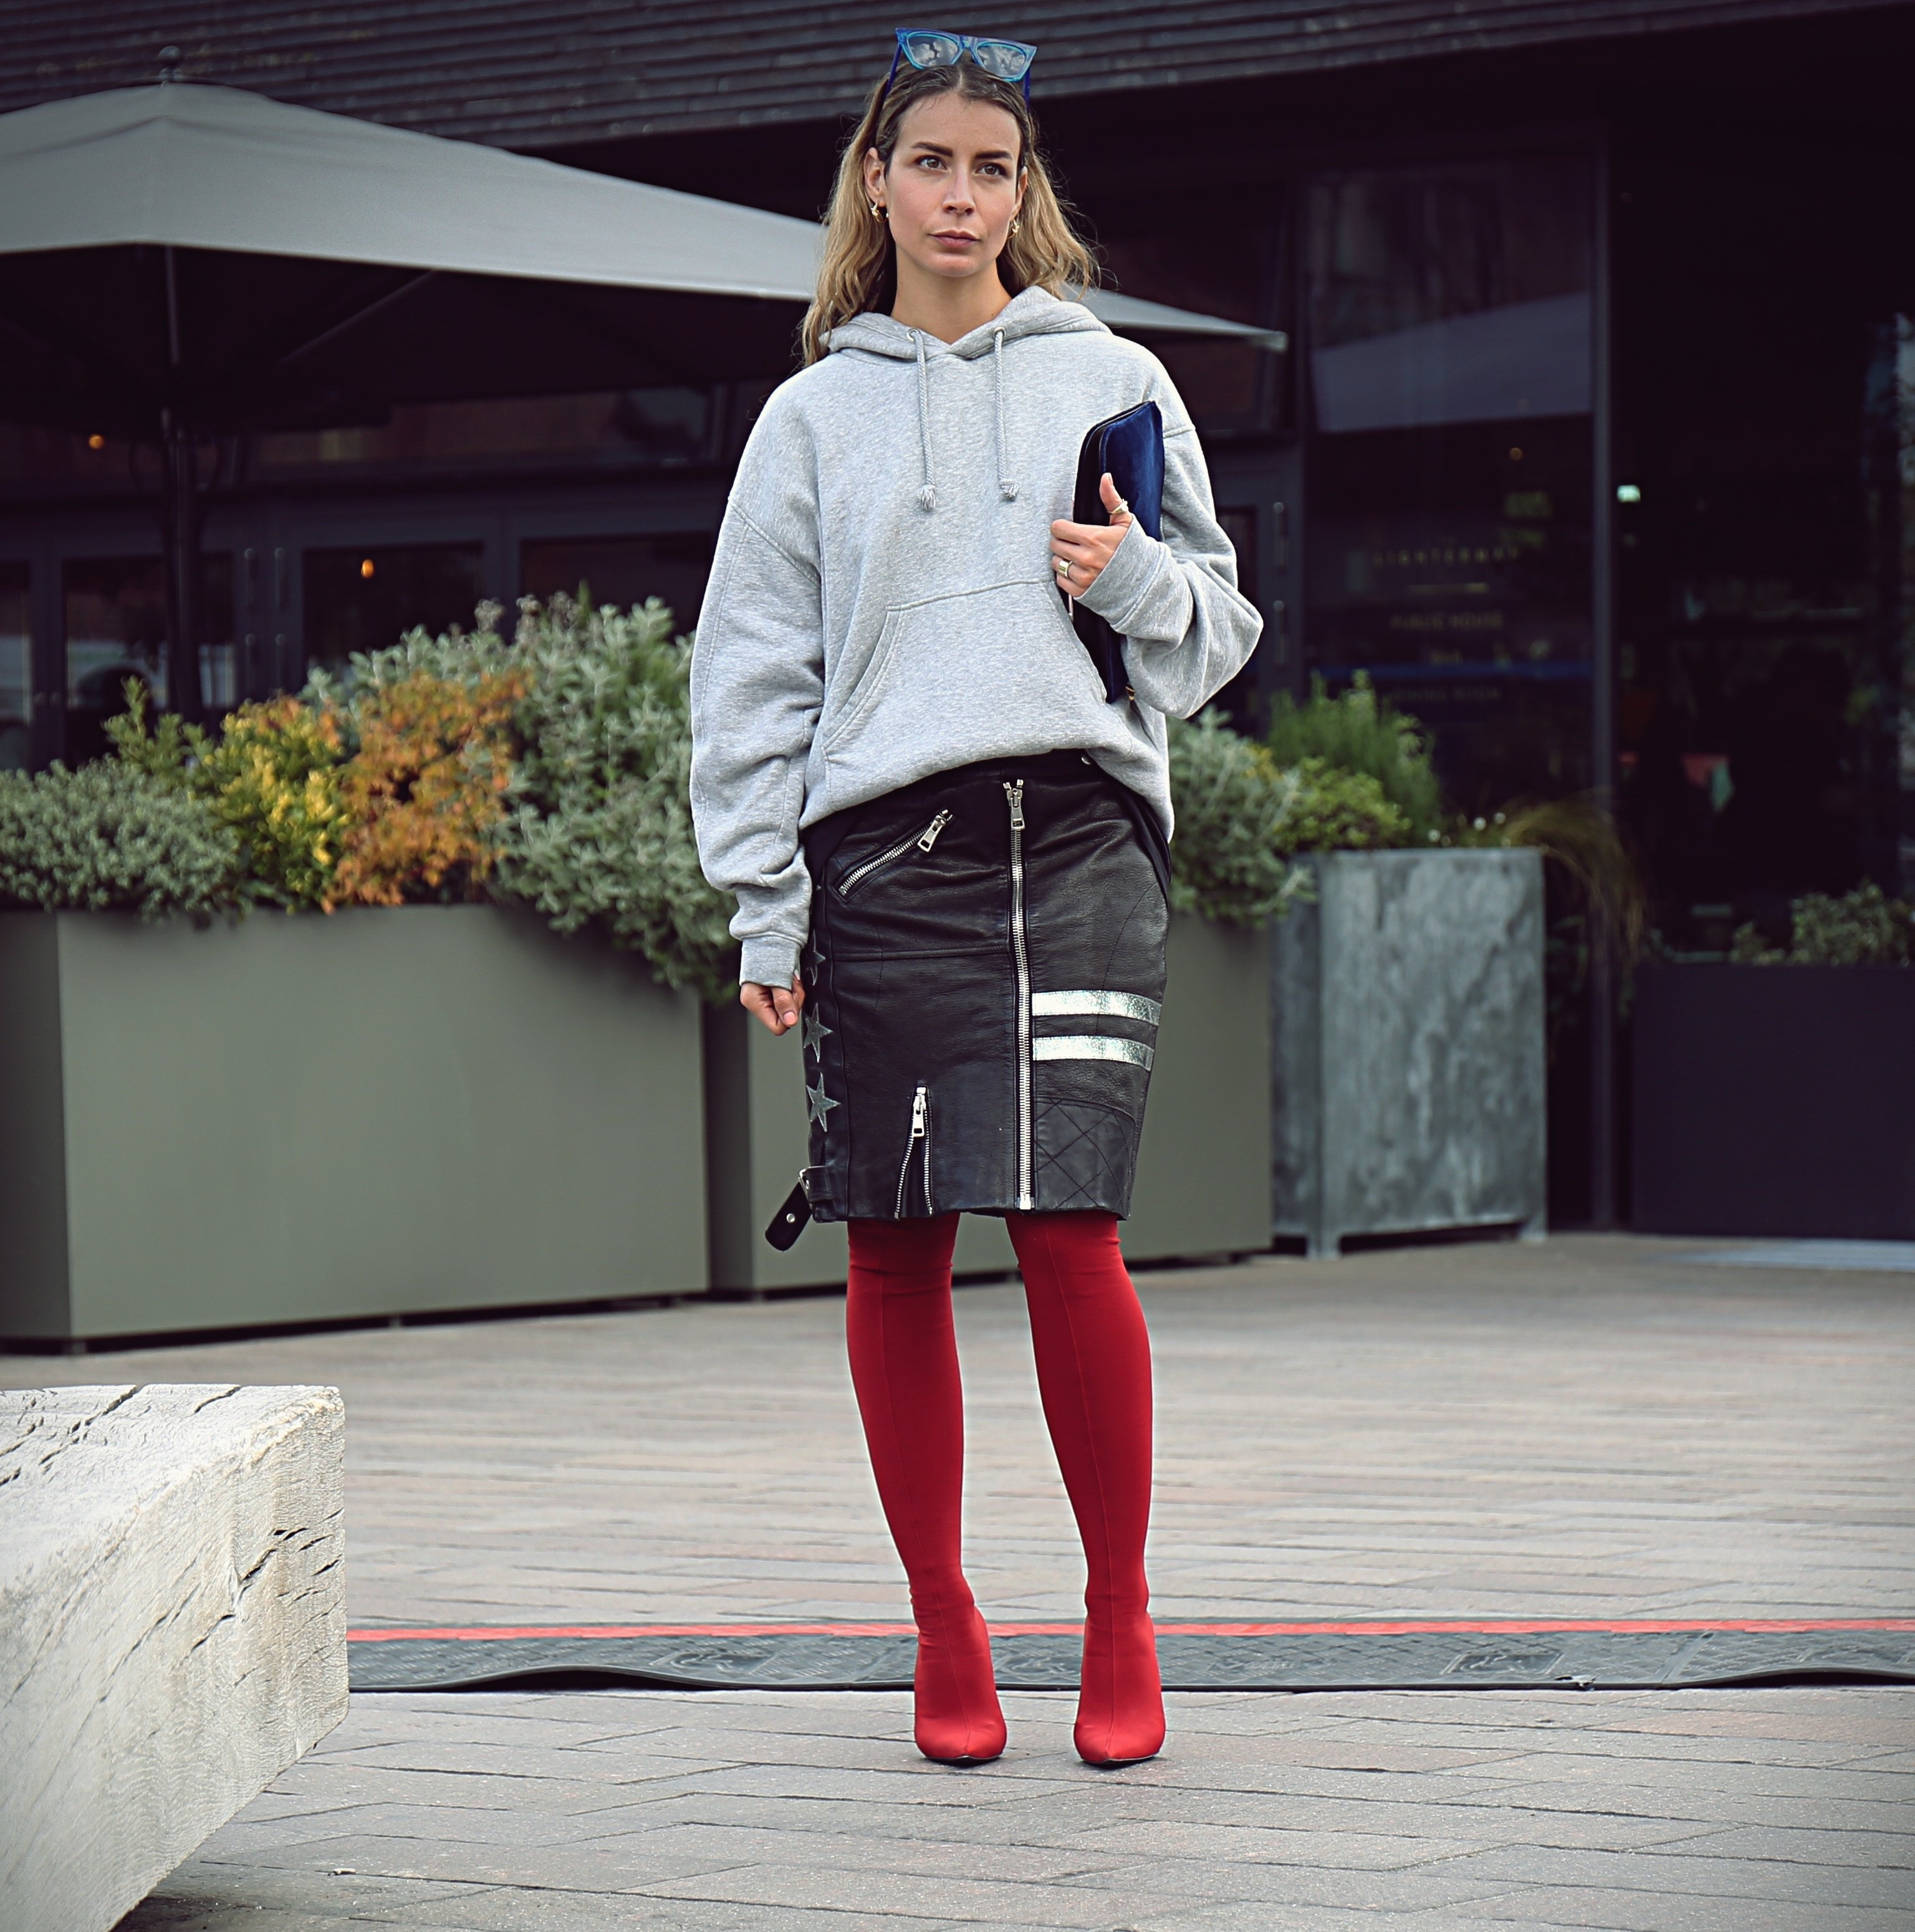 September 17, 2017 - London, United Kingdom - LONDON- 17 September 2017 Irina Lakicevic on the street during the London Fashion Week, Image: 356045178, License: Rights-managed, Restrictions: , Model Release: no, Credit line: Profimedia, Zuma Press - Entertaiment